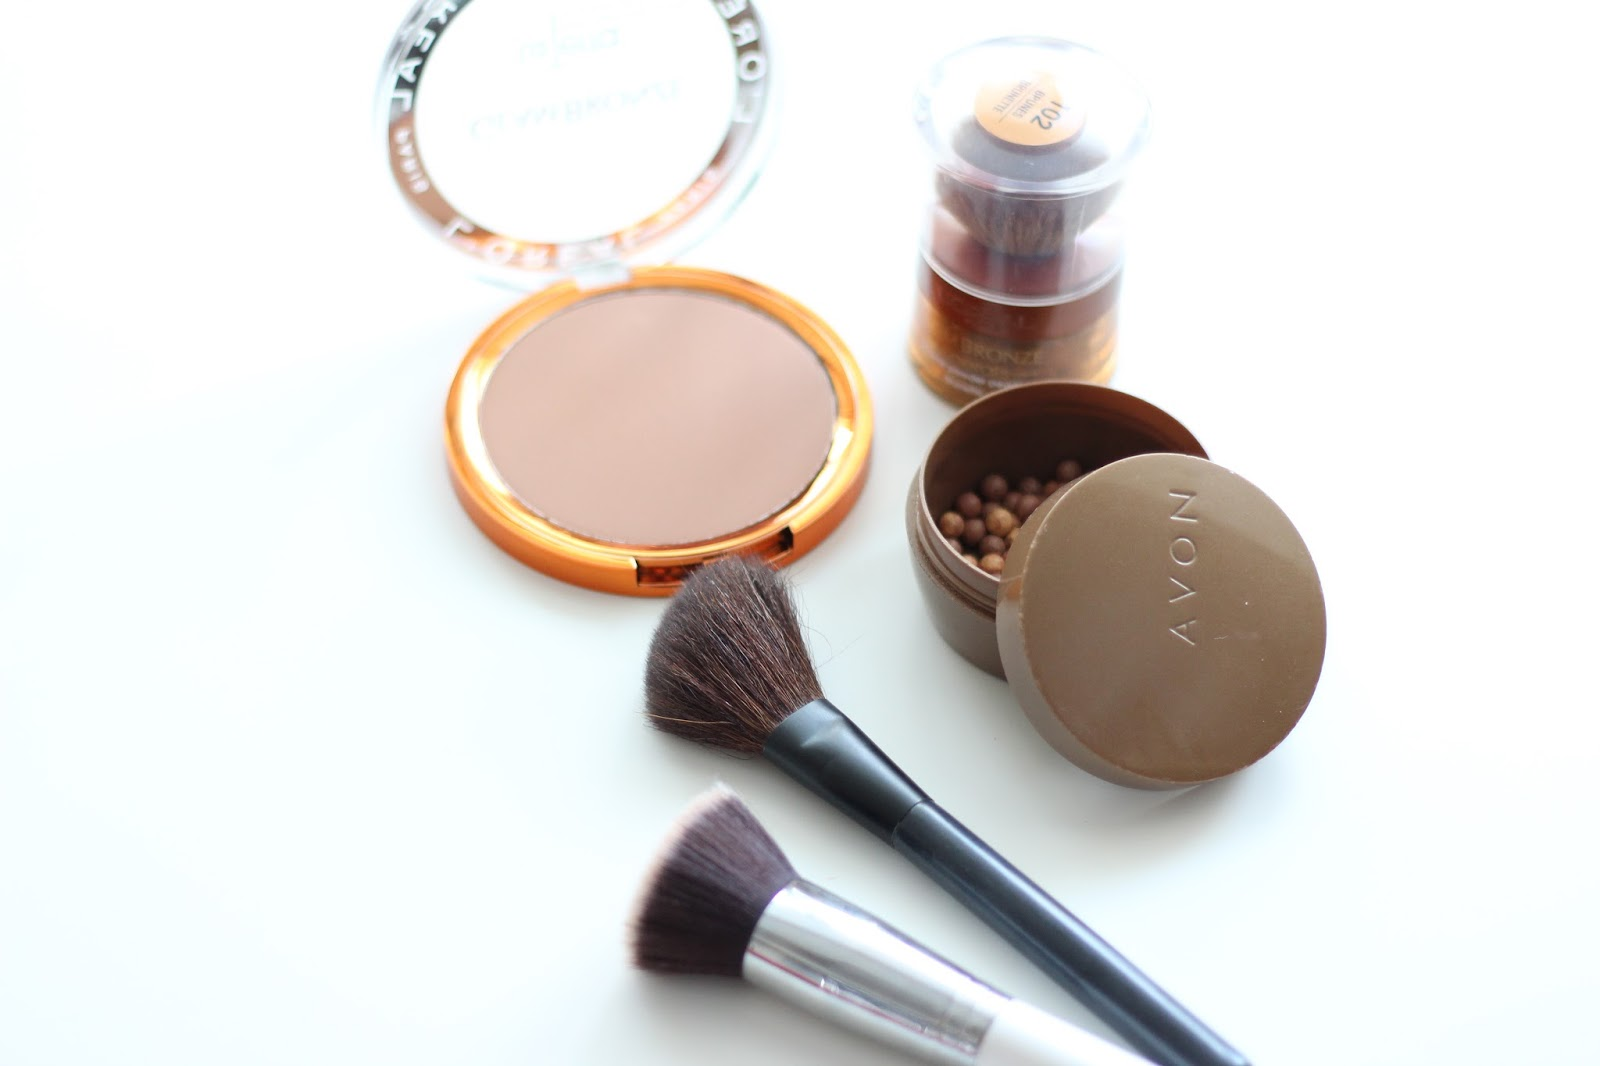 bronzer review loreal bronzing powder bulgarian beauty blog avon www.quitealooker.com